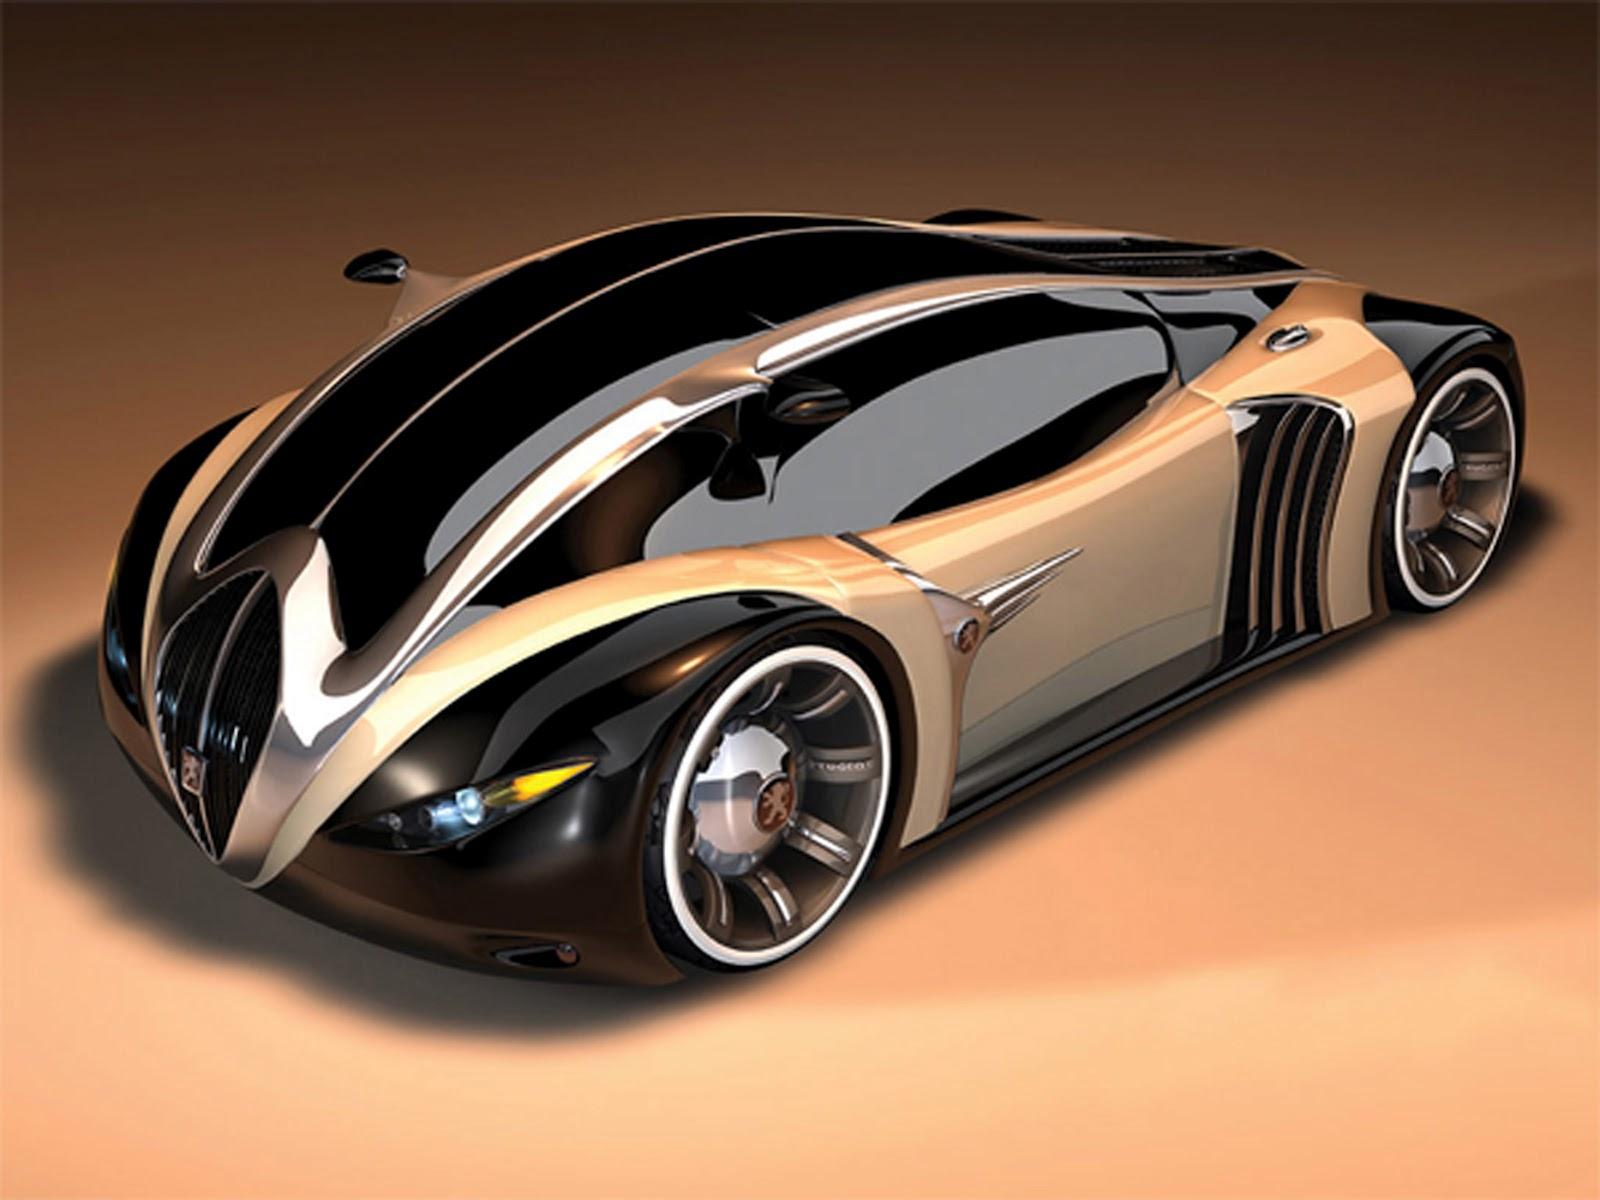 dsng 39 s sci fi megaverse muscle cars classics concepts cars horsepower. Black Bedroom Furniture Sets. Home Design Ideas